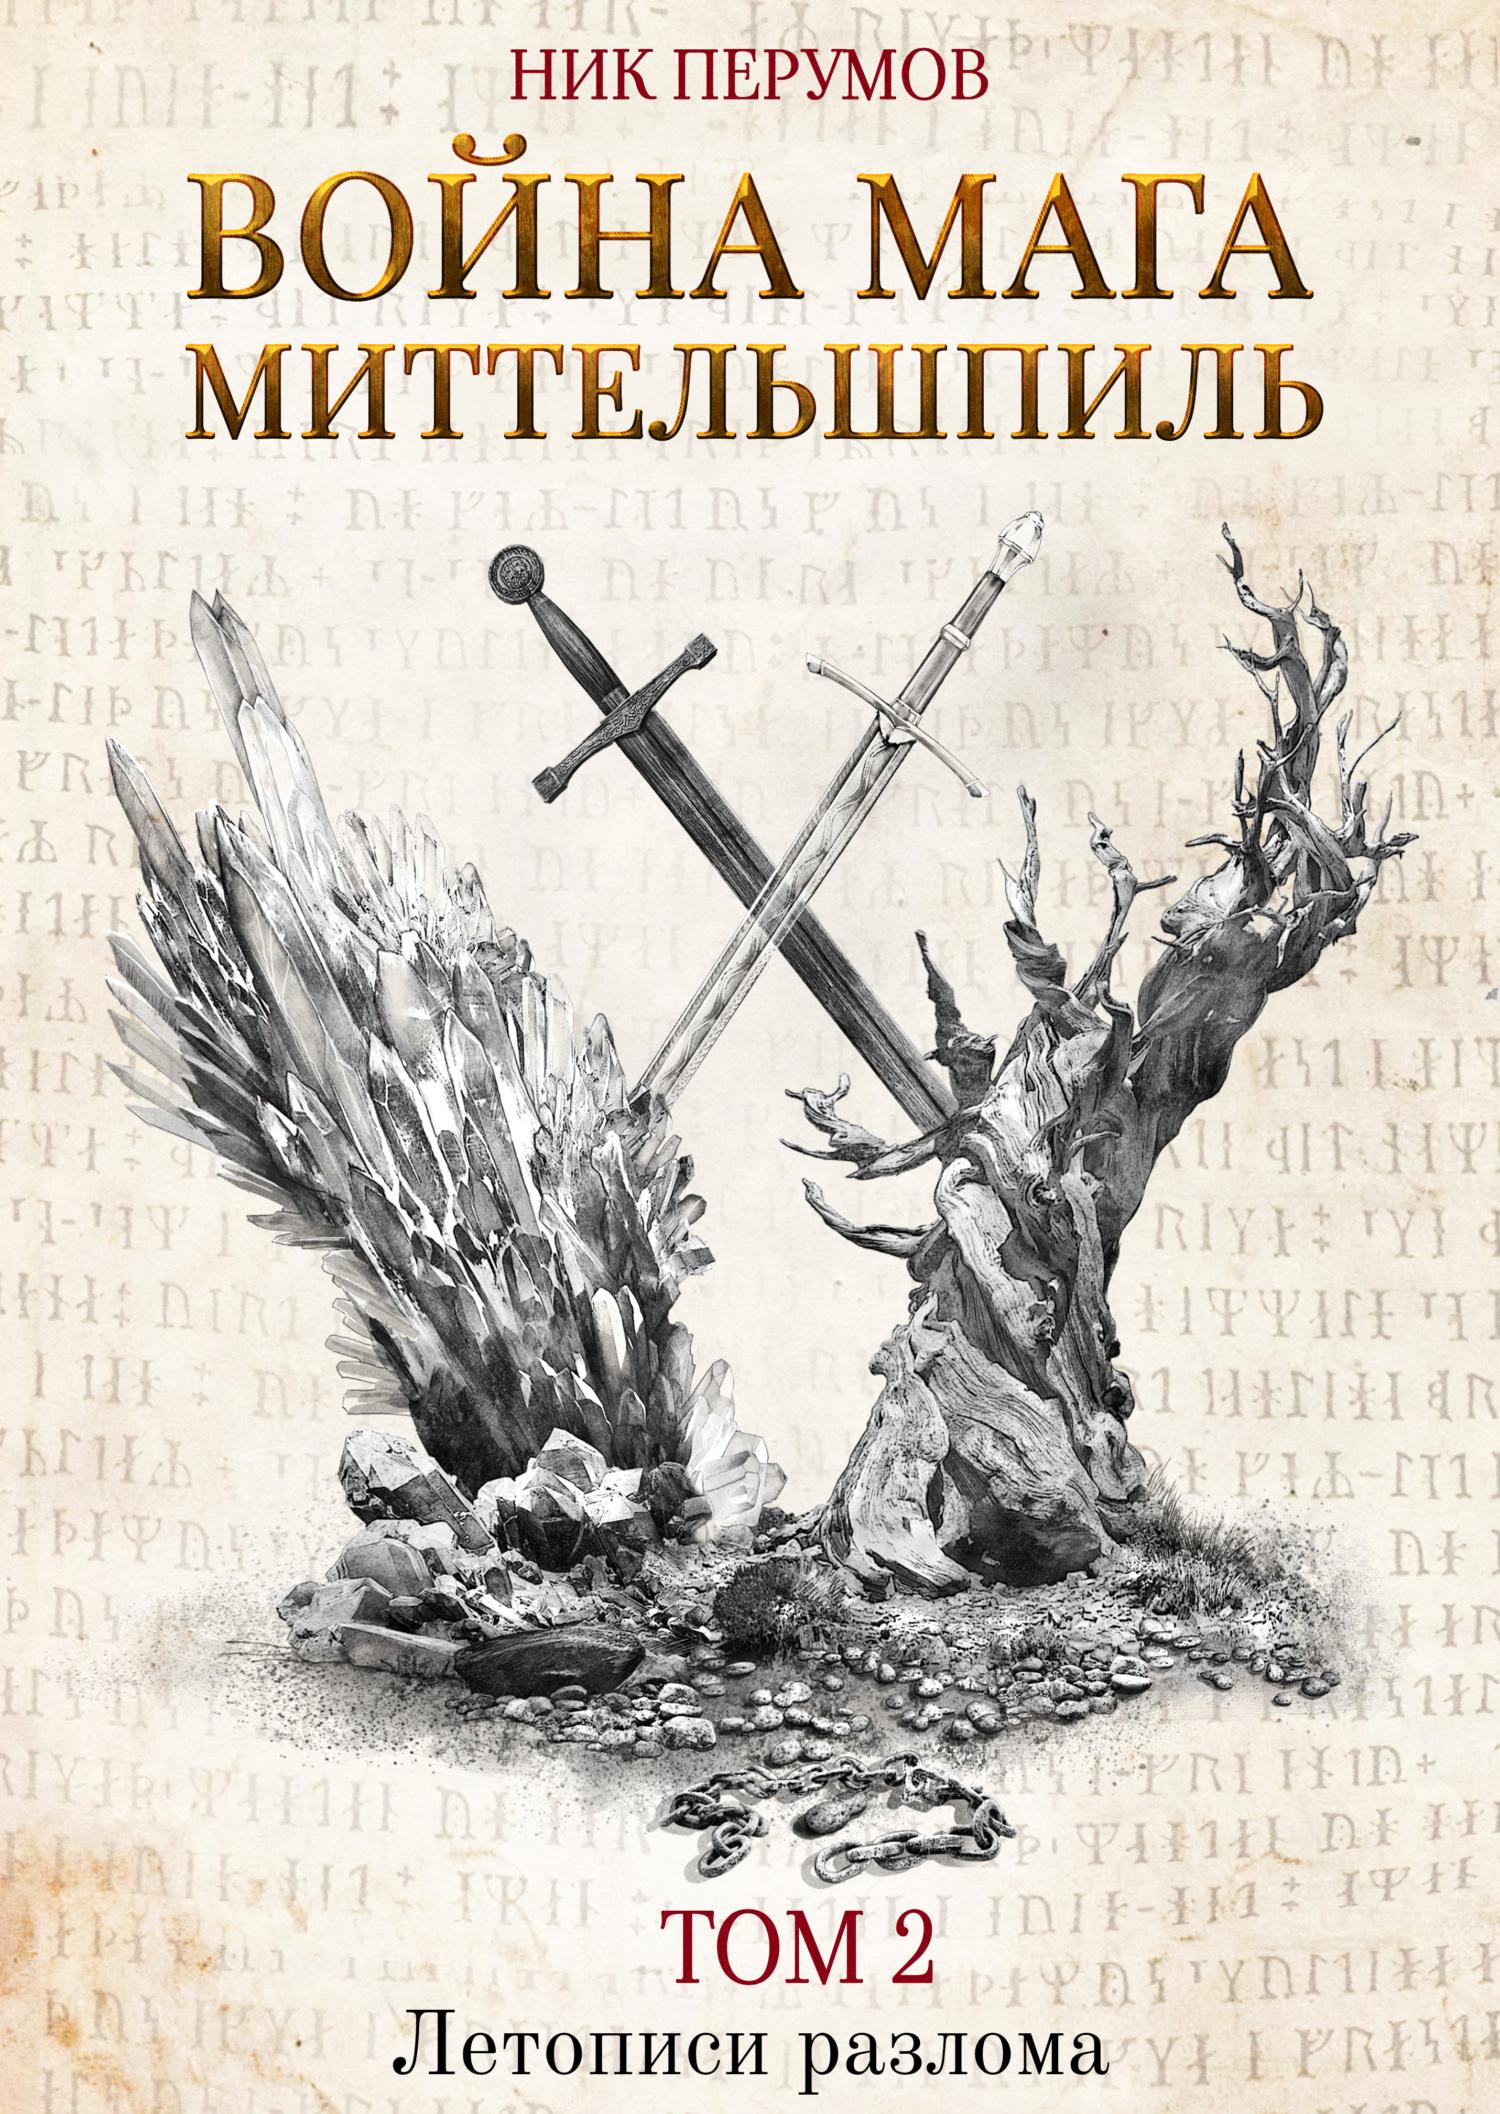 Дроздов Анатолий Федорович. Капеллан (книга завершена)